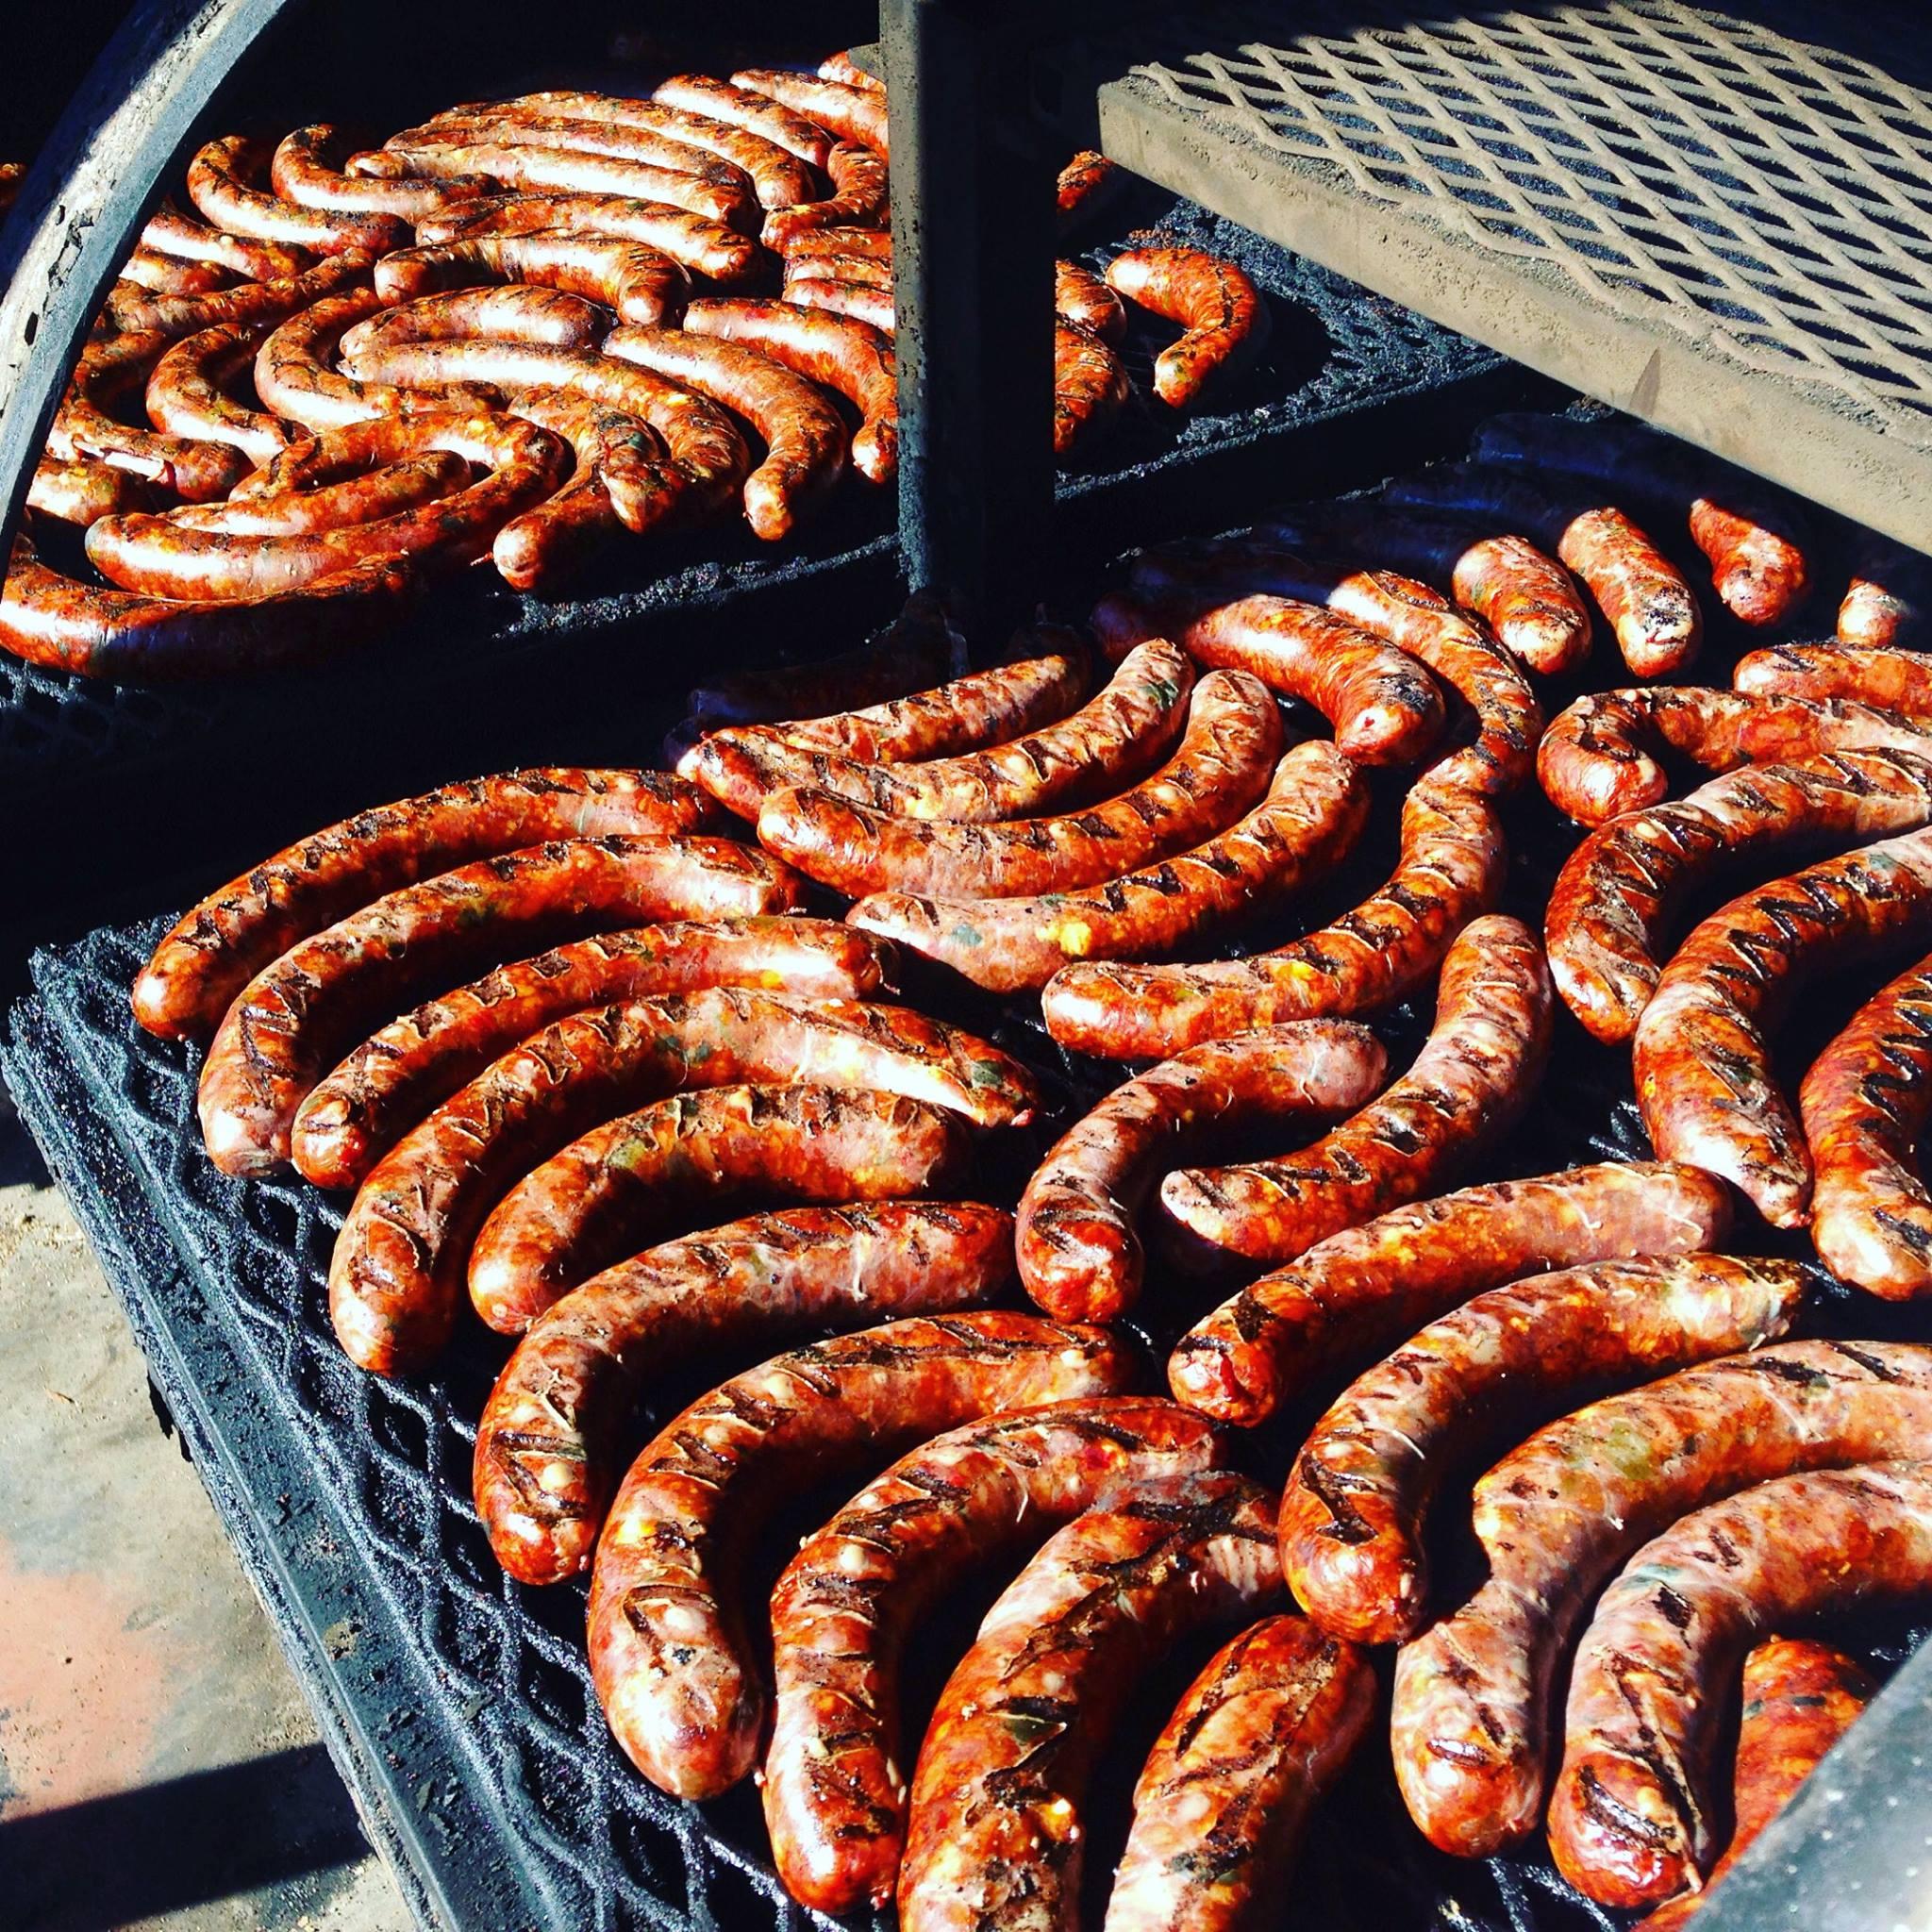 Smokey Denmark's sausages